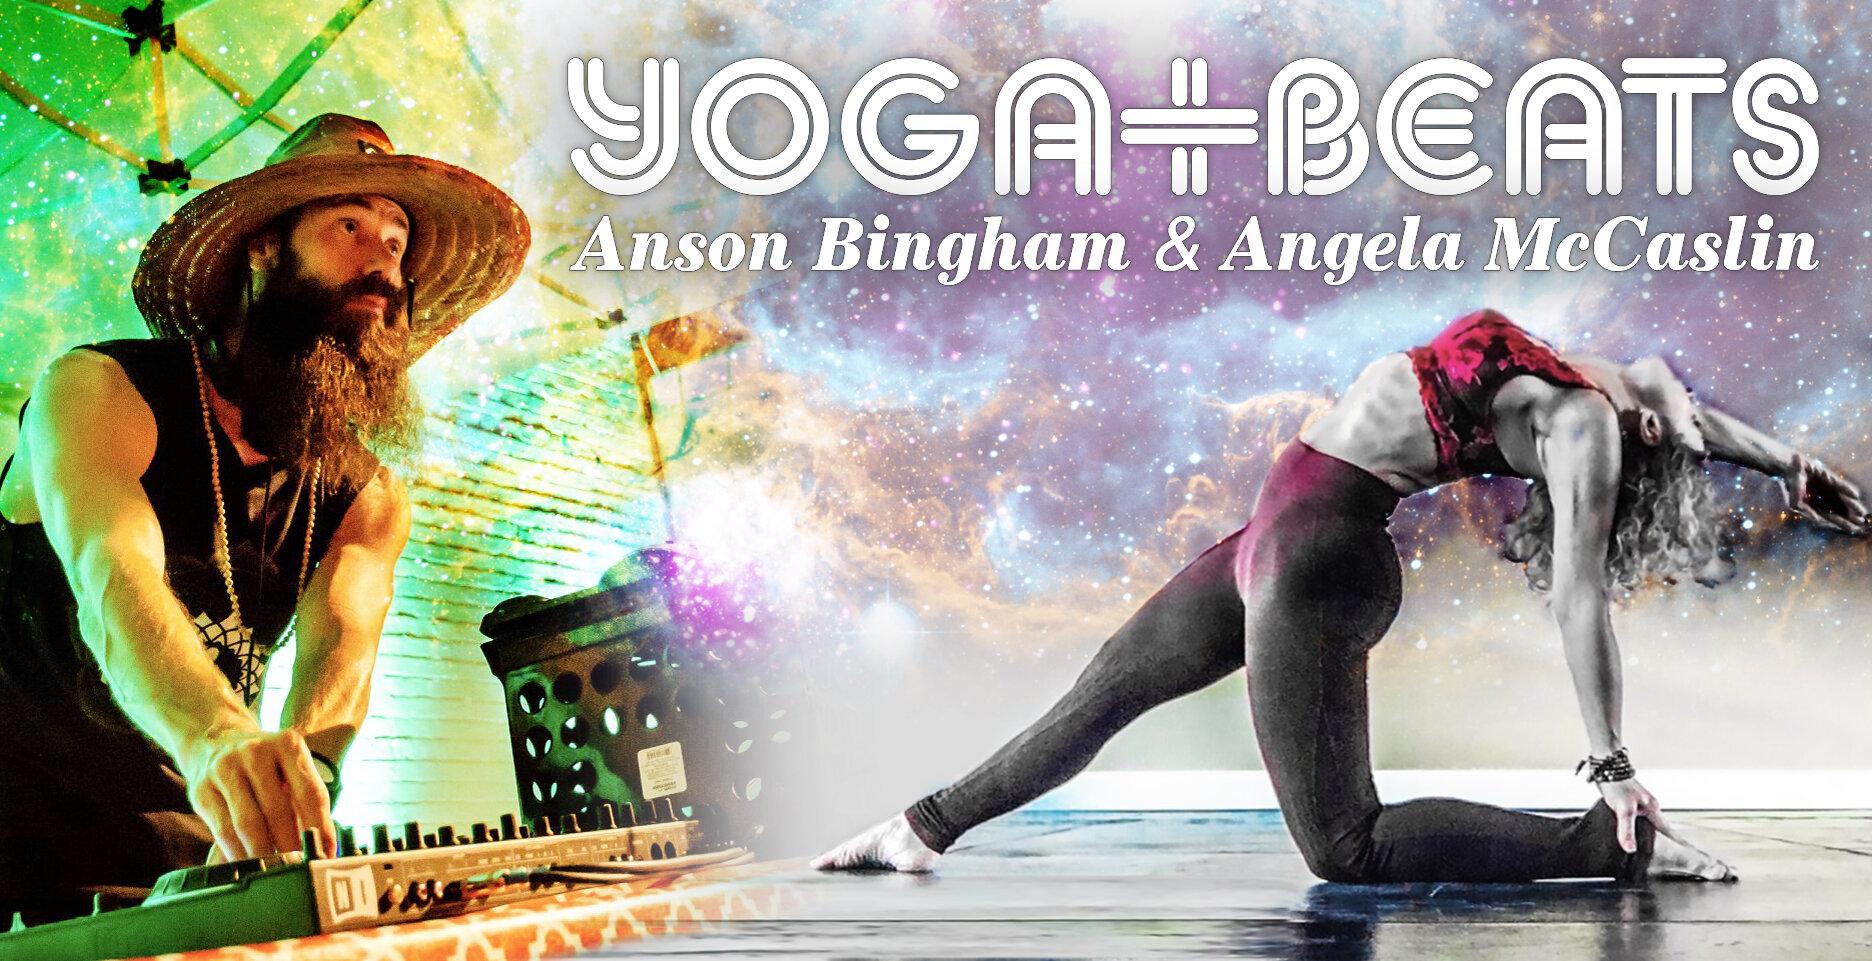 Yoga + Beats with DJ Anson Bingham and Angela McCaslin at Yoga Fun Day Yoga Festival.jpg